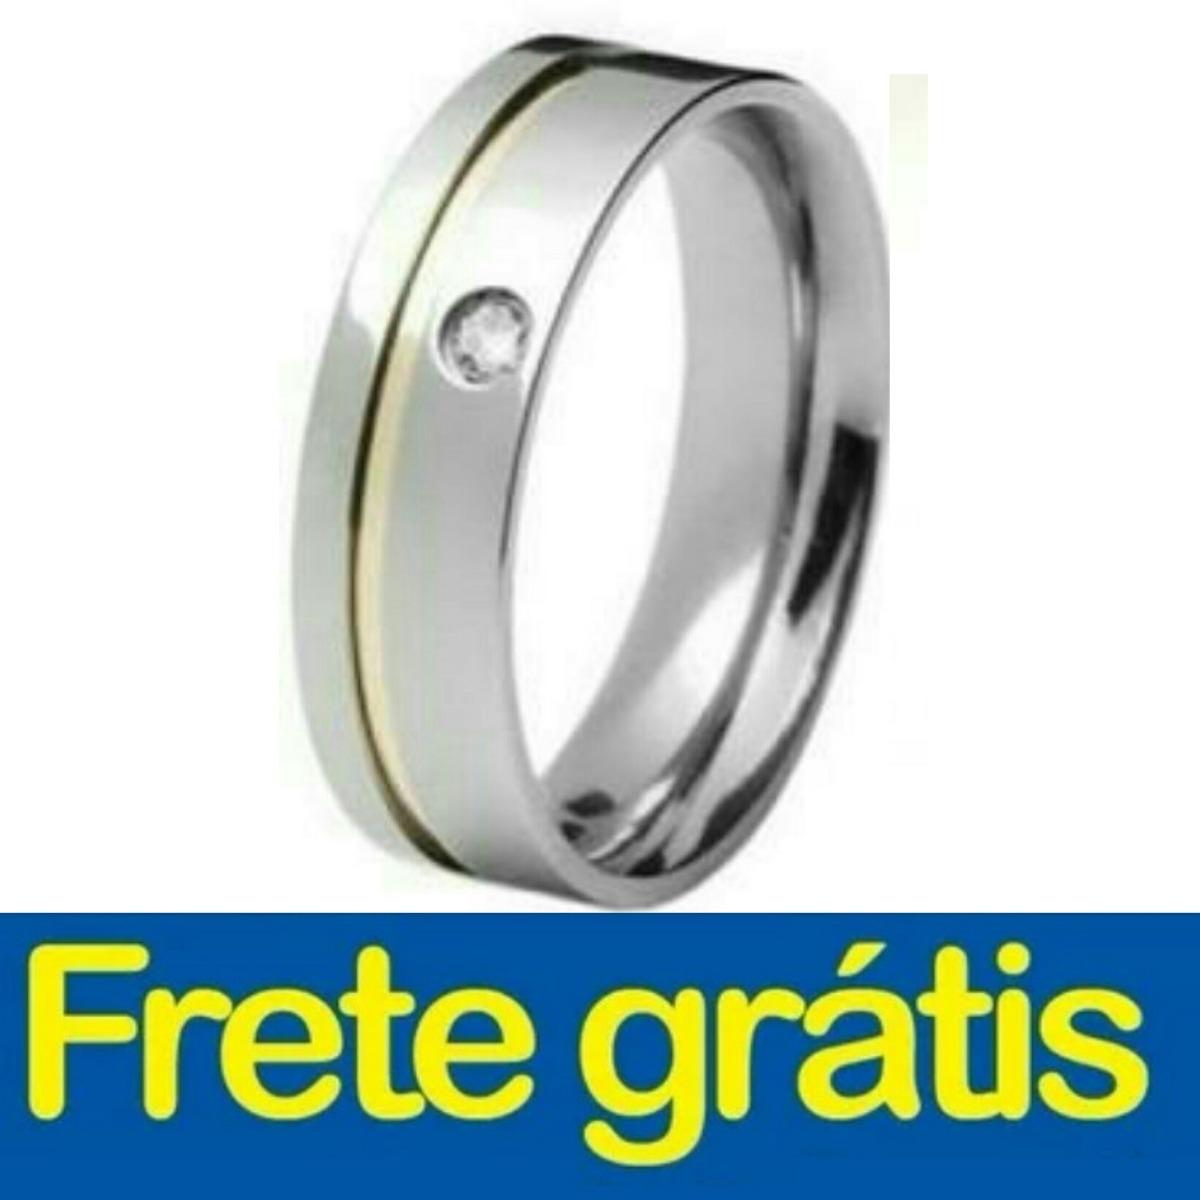 c30bed84341 par alianca namoro anel inox prata compromisso frete grátis. Carregando  zoom.